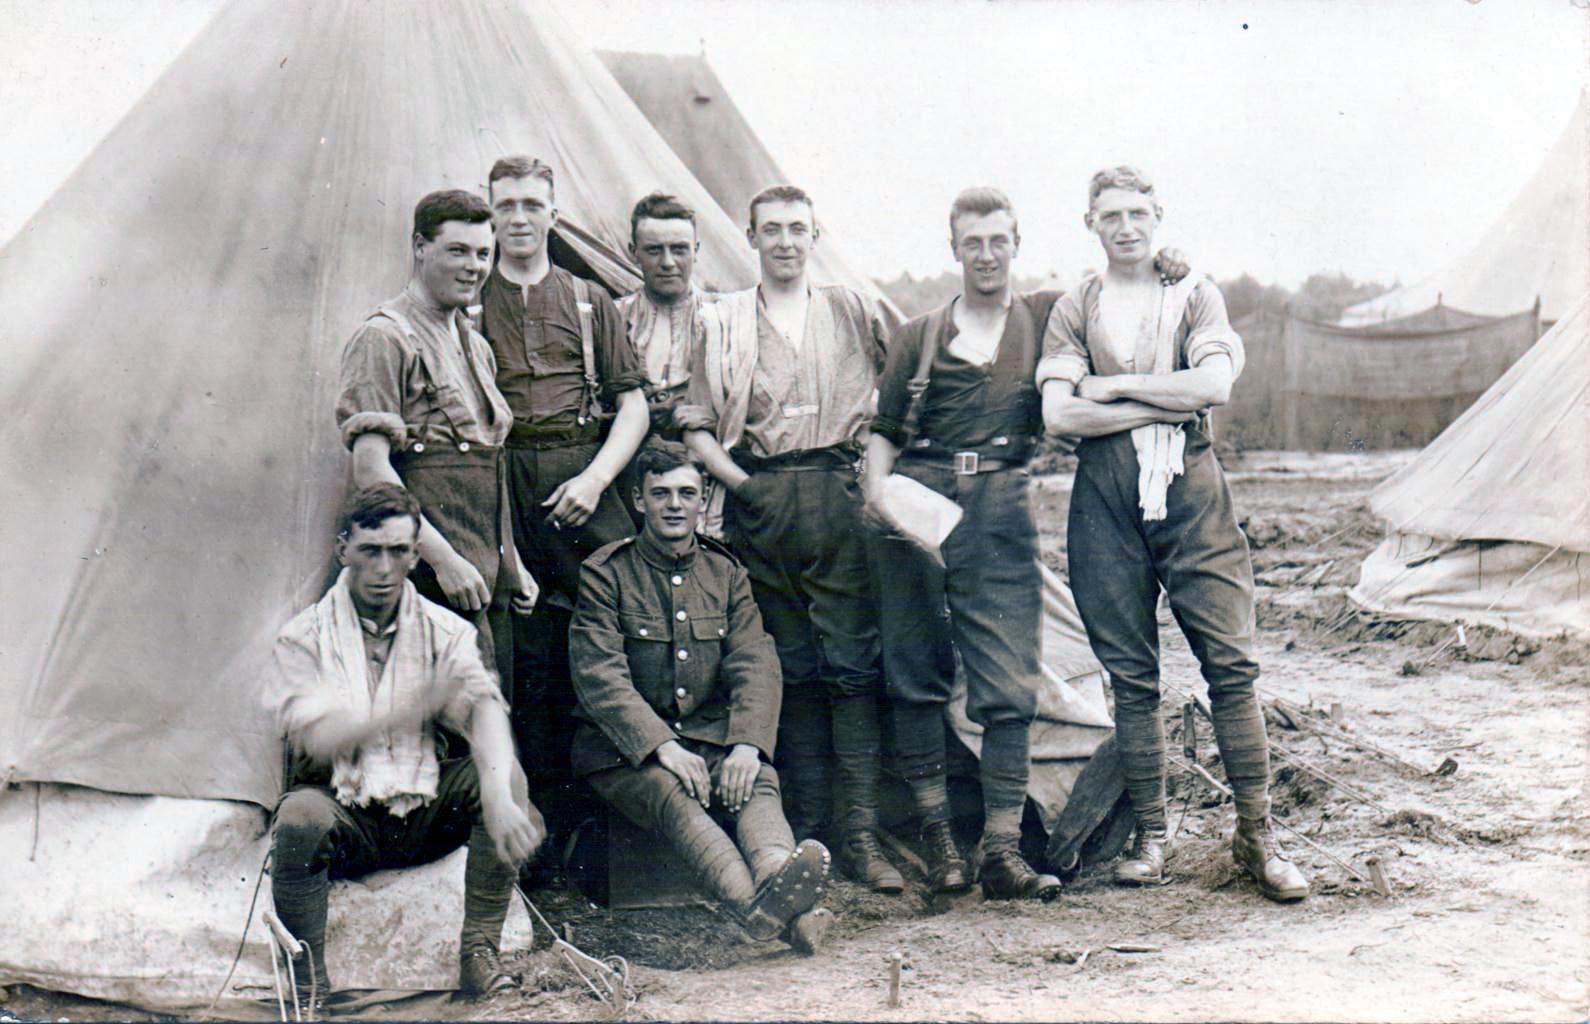 Gunner RA taken 1914 is seated in tunic